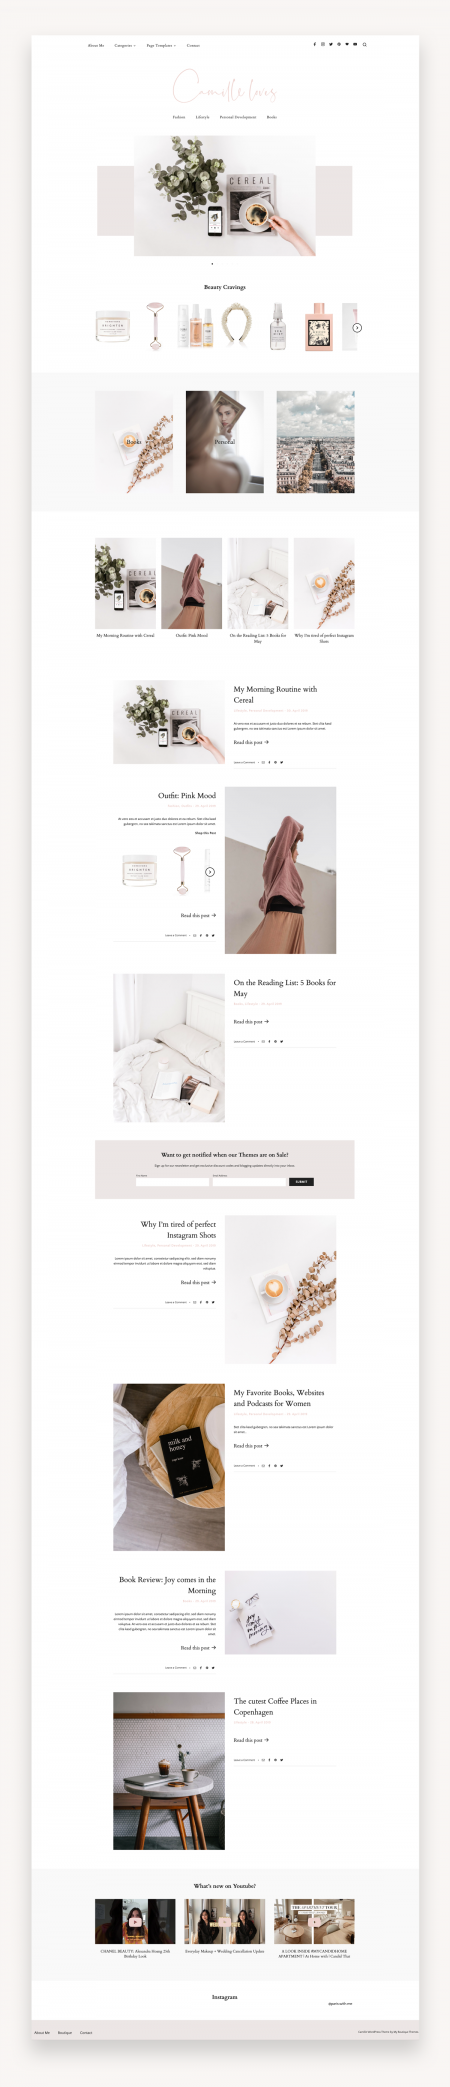 Minimal Blog Theme Camille